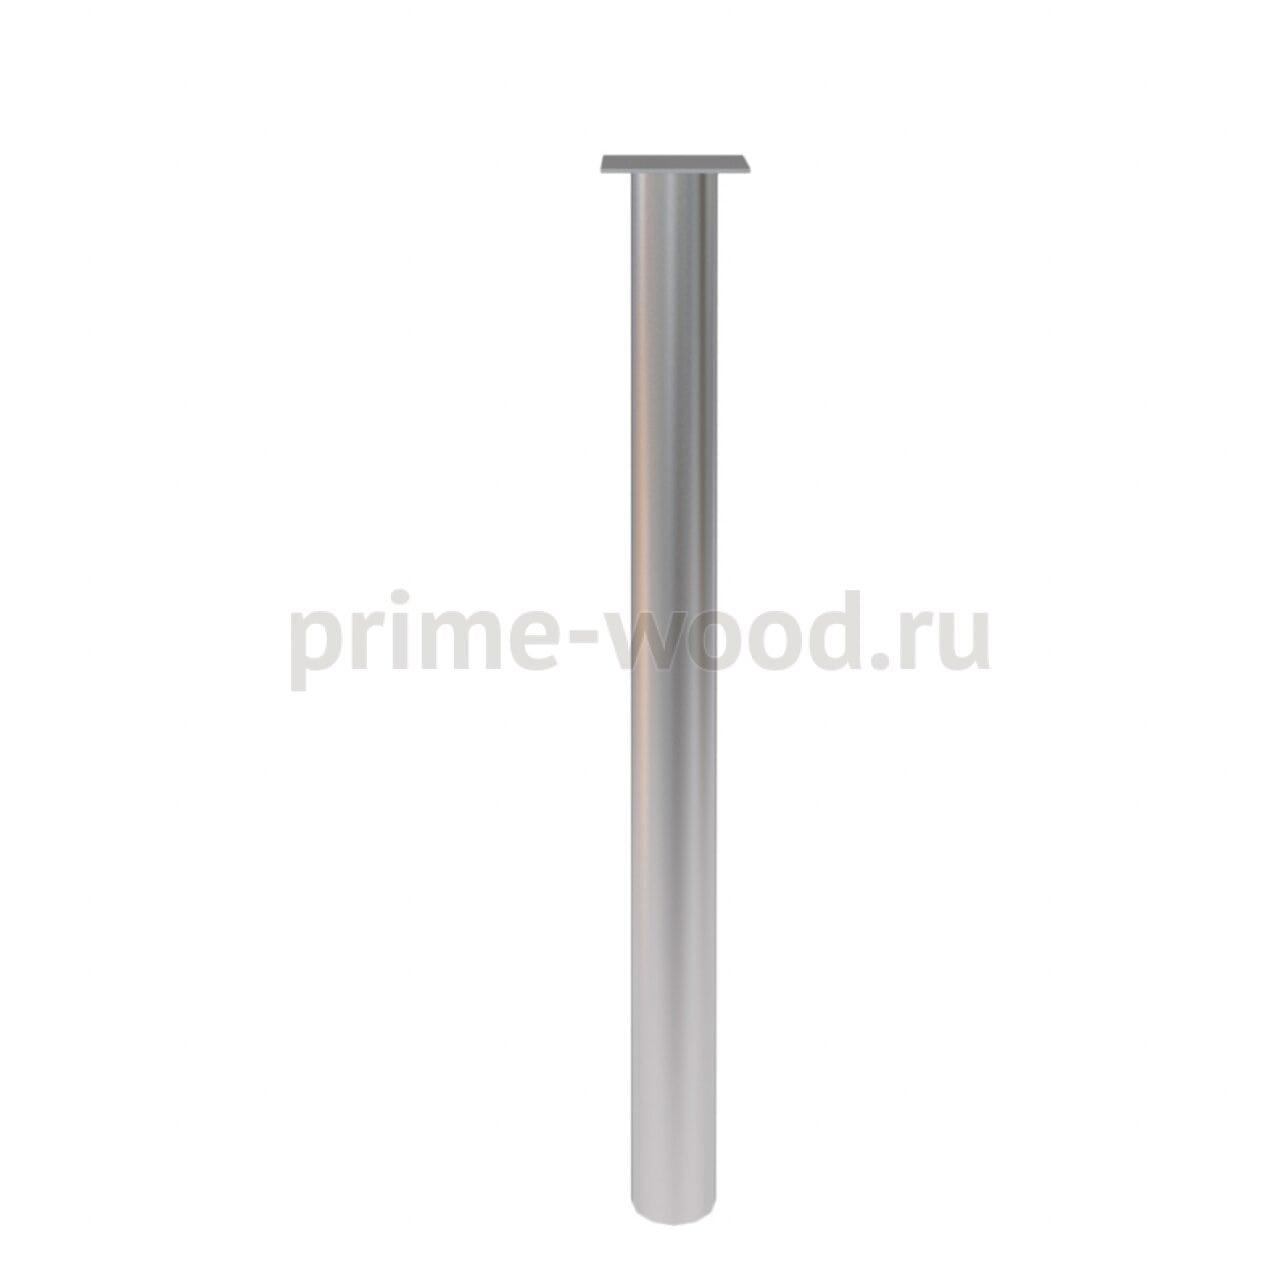 Опора металлическая  Simple 6x6x74 - фото 1